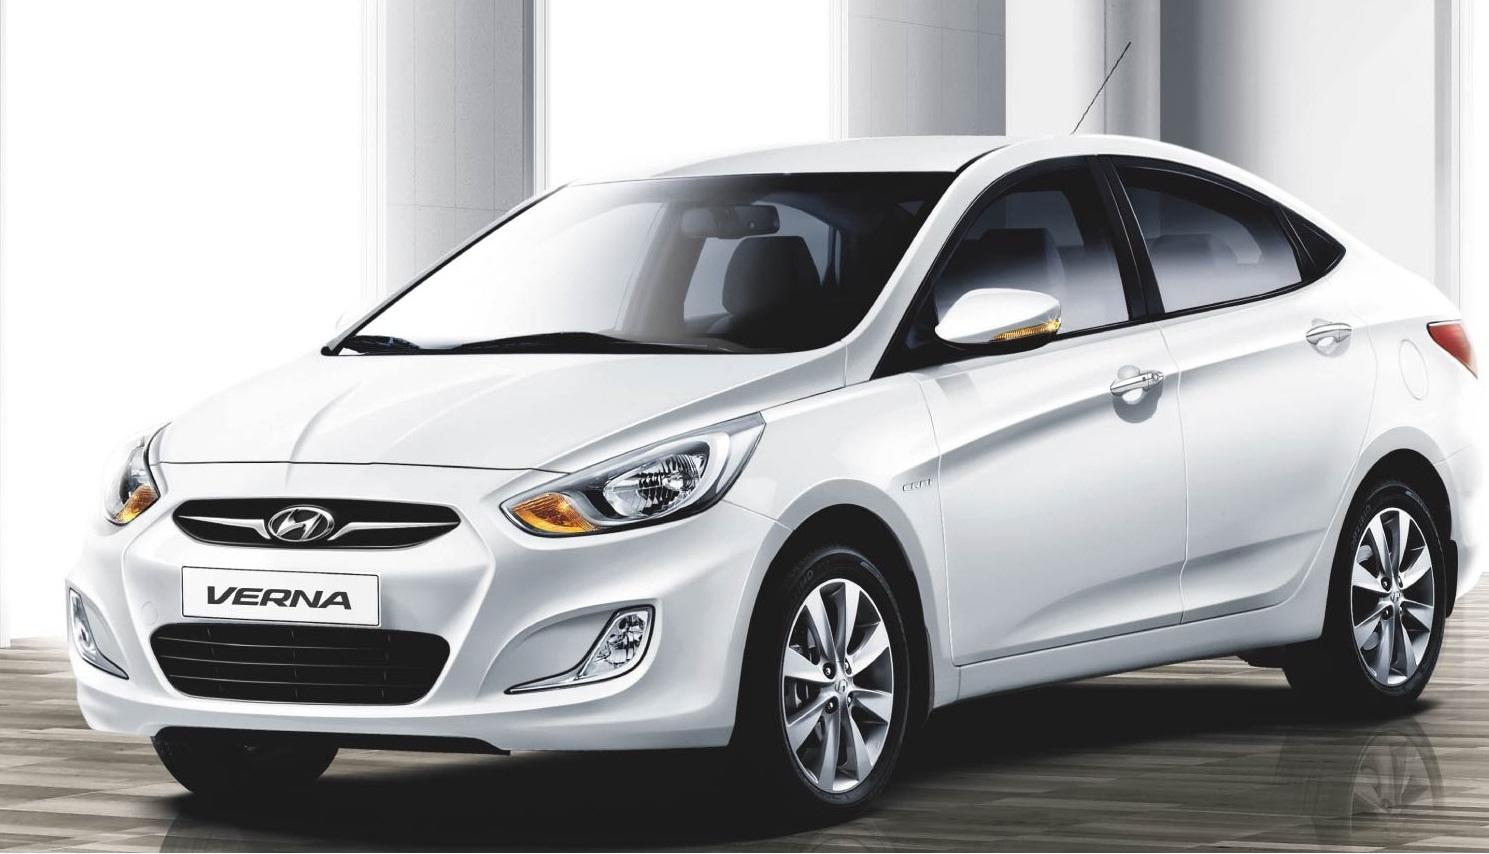 Hyundai fluidic verna vs honda city vs sx4 for Honda or hyundai